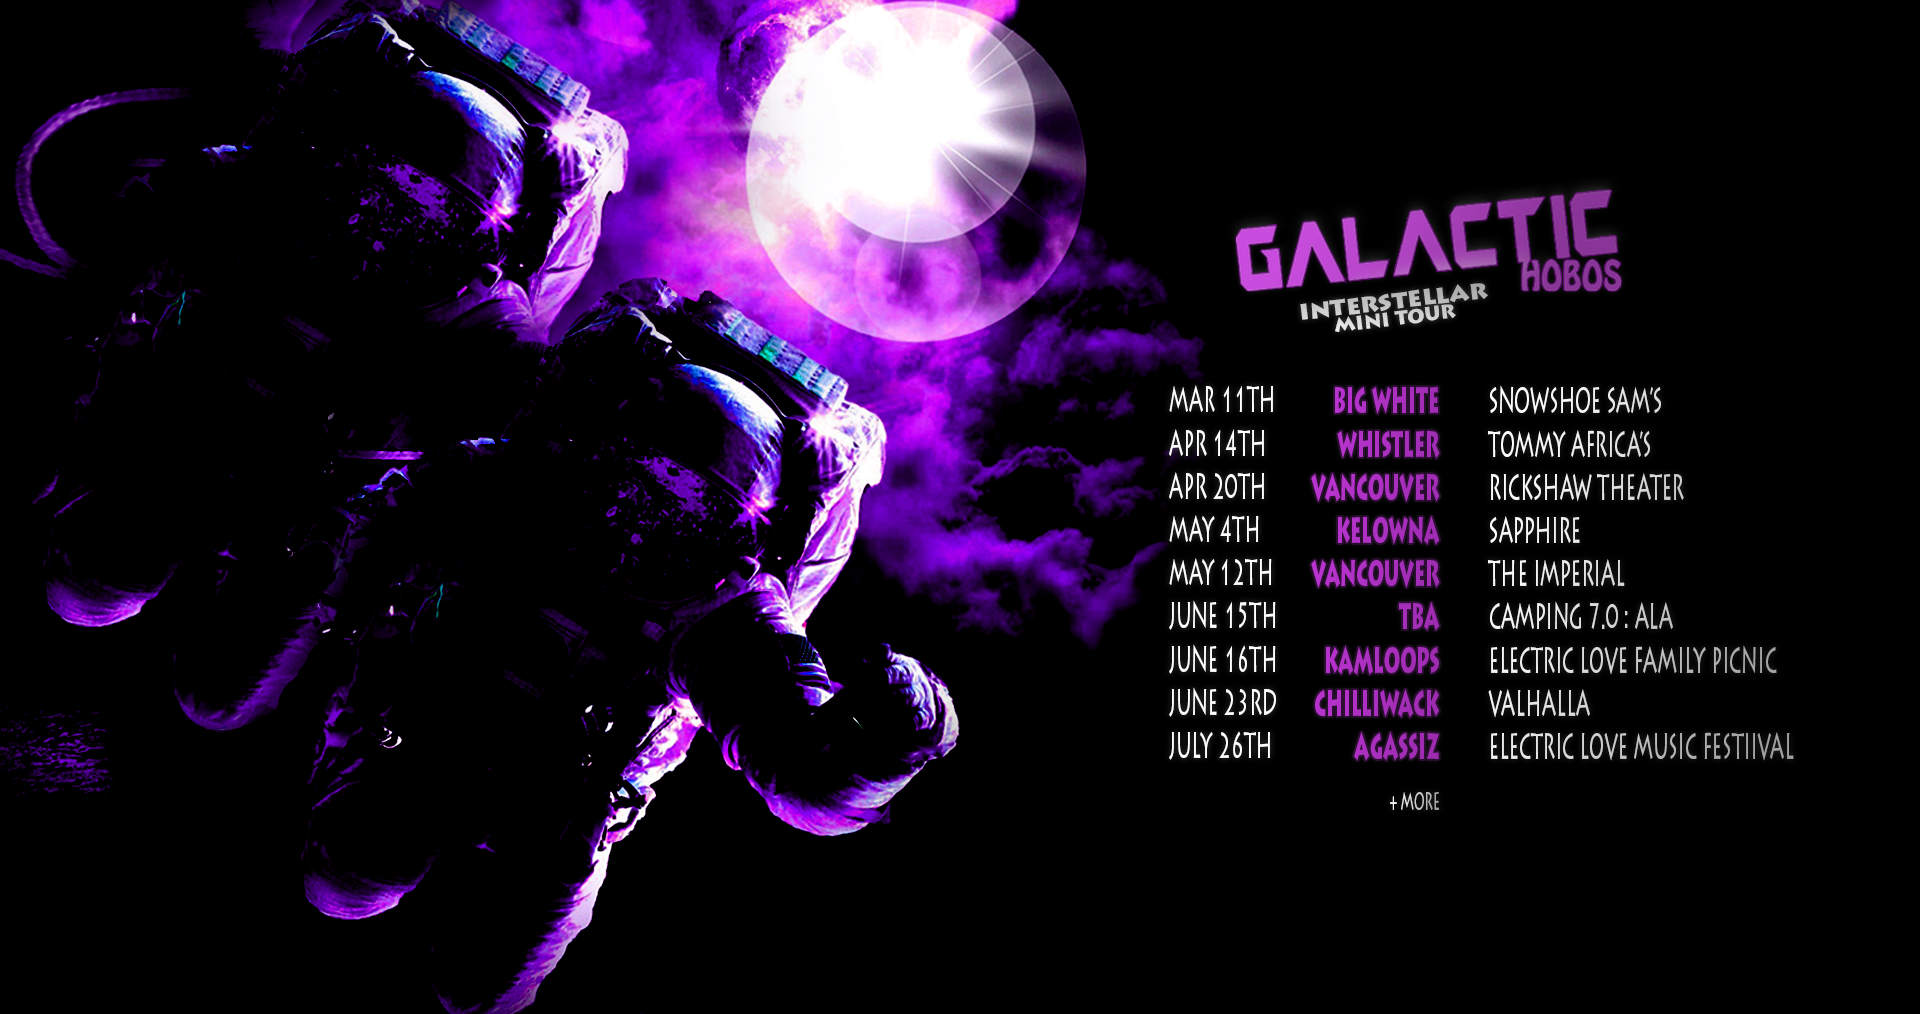 VSEP064_10_Galactic Hobos_35540860_614700575555688_9064395944107180032_o.png